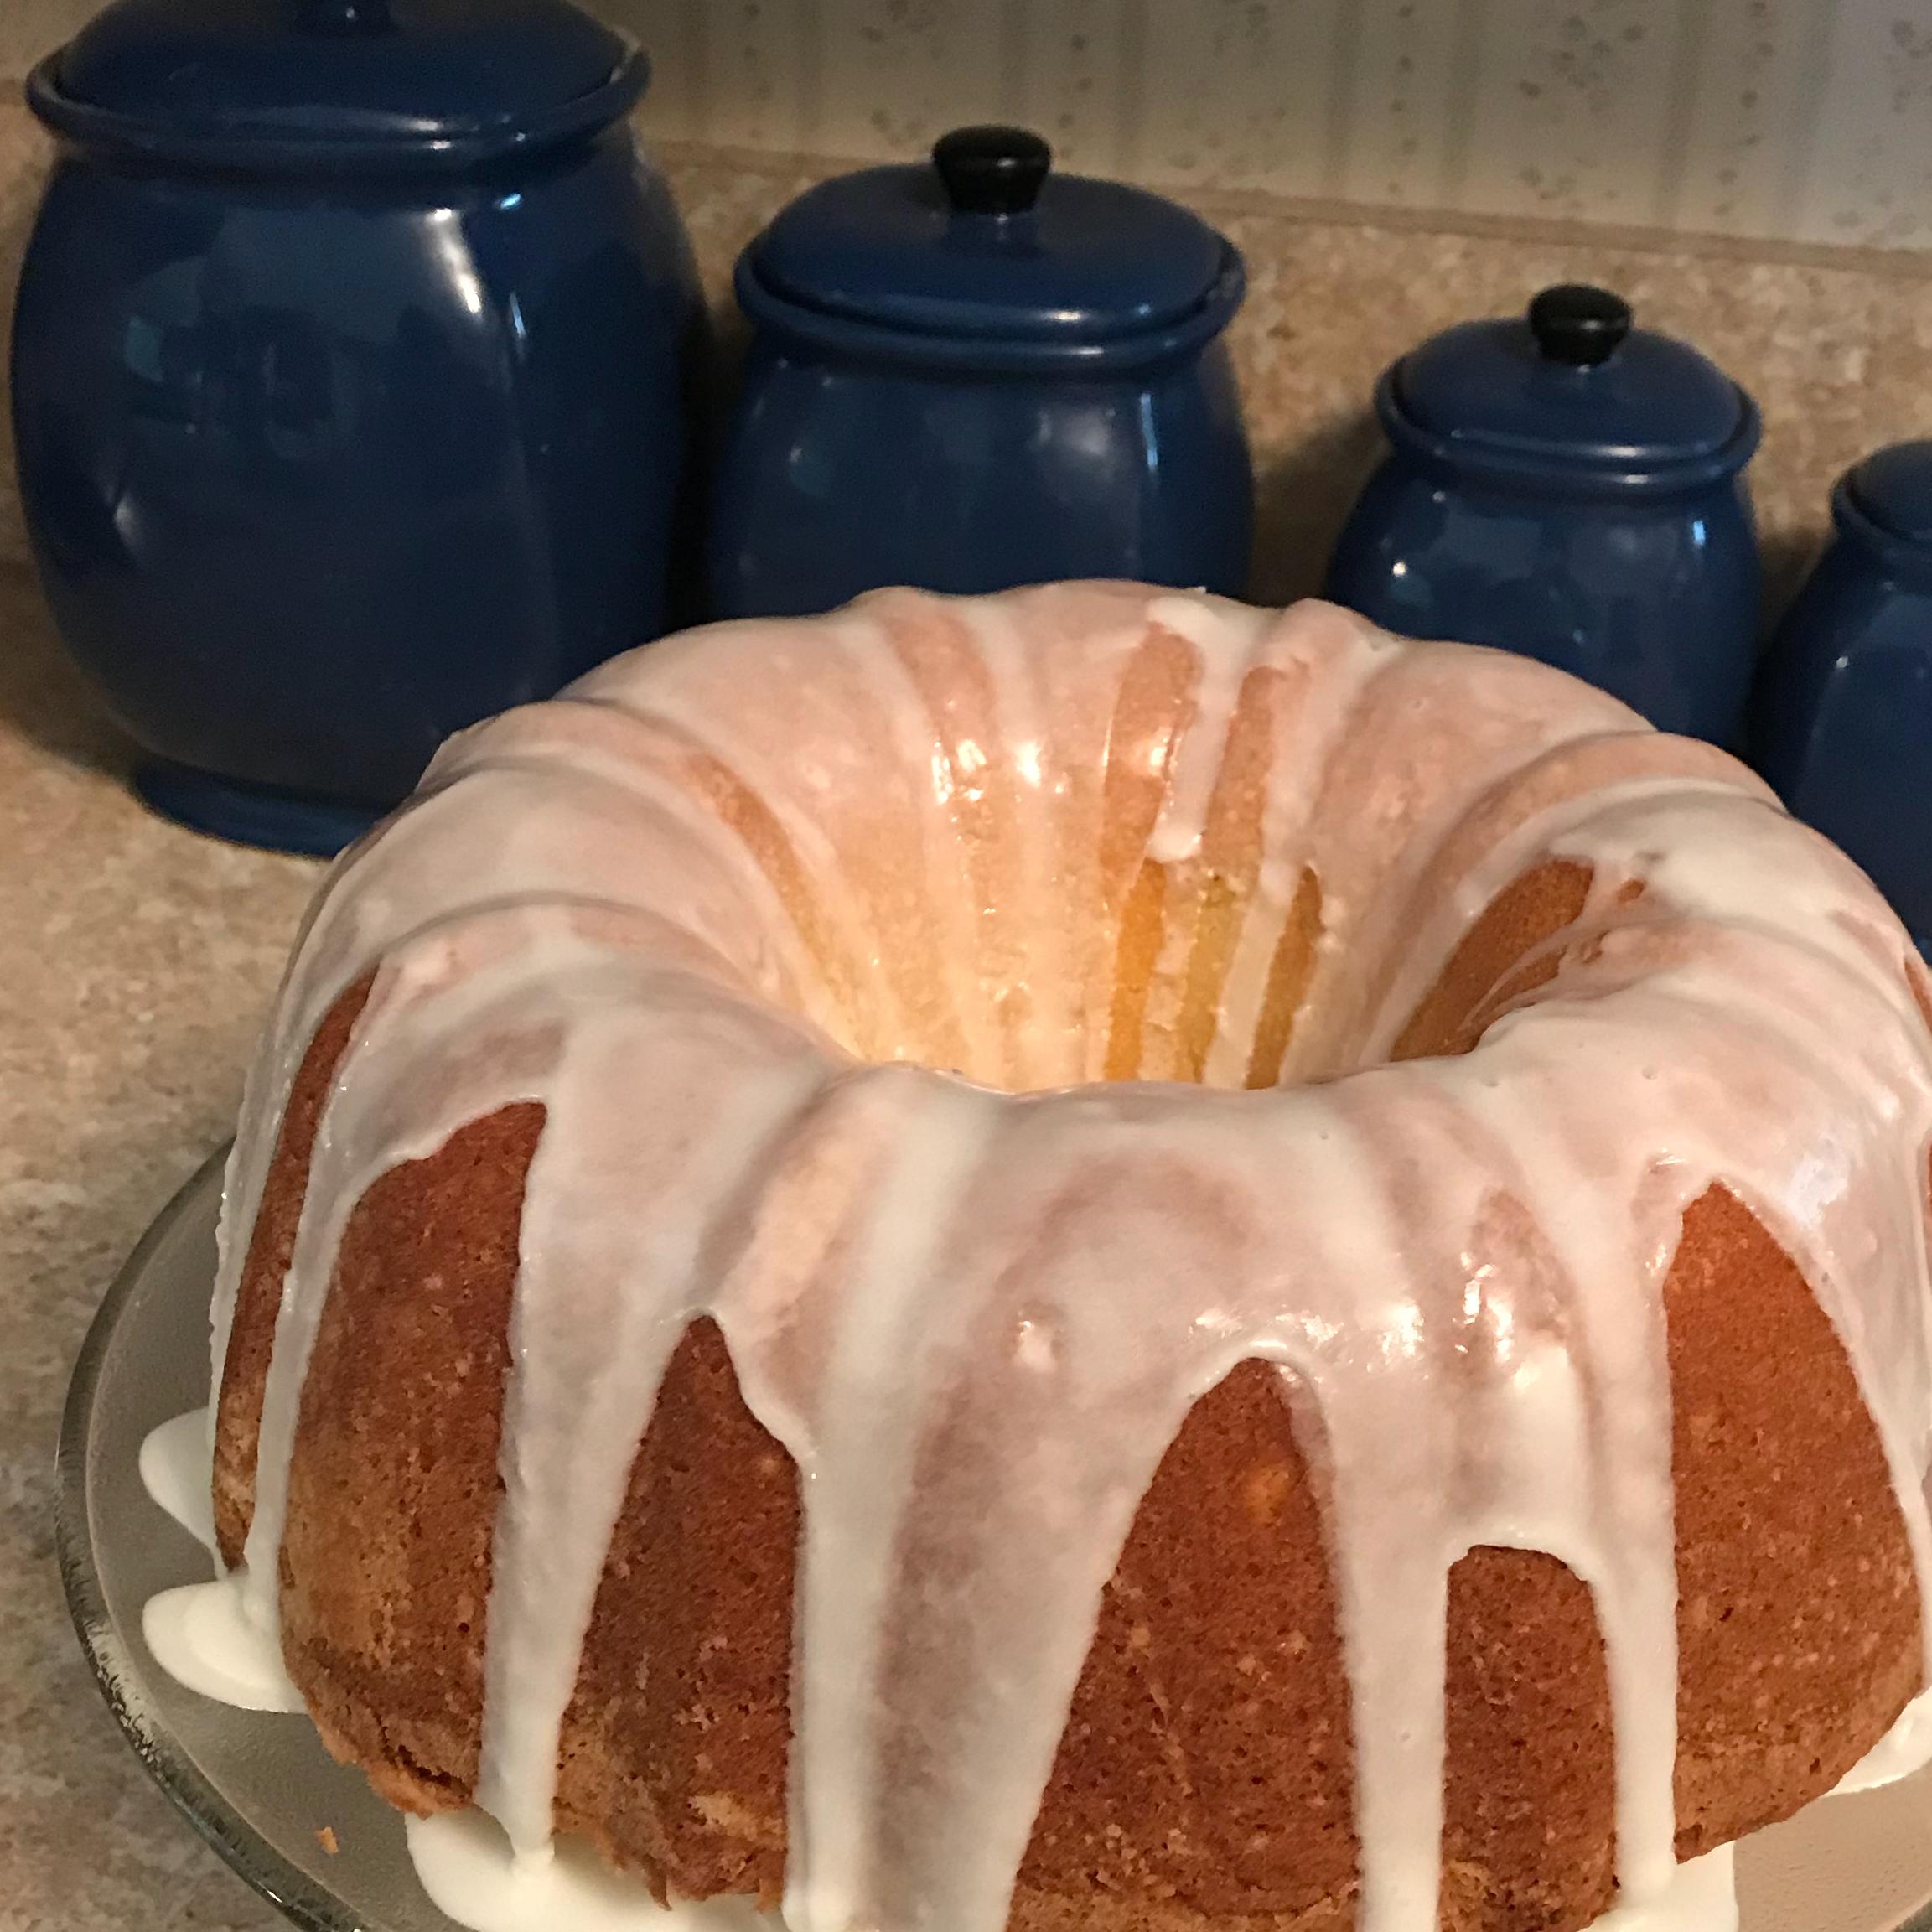 Lemon-Buttermilk Pound Cake with Aunt Evelyn's Lemon Glaze